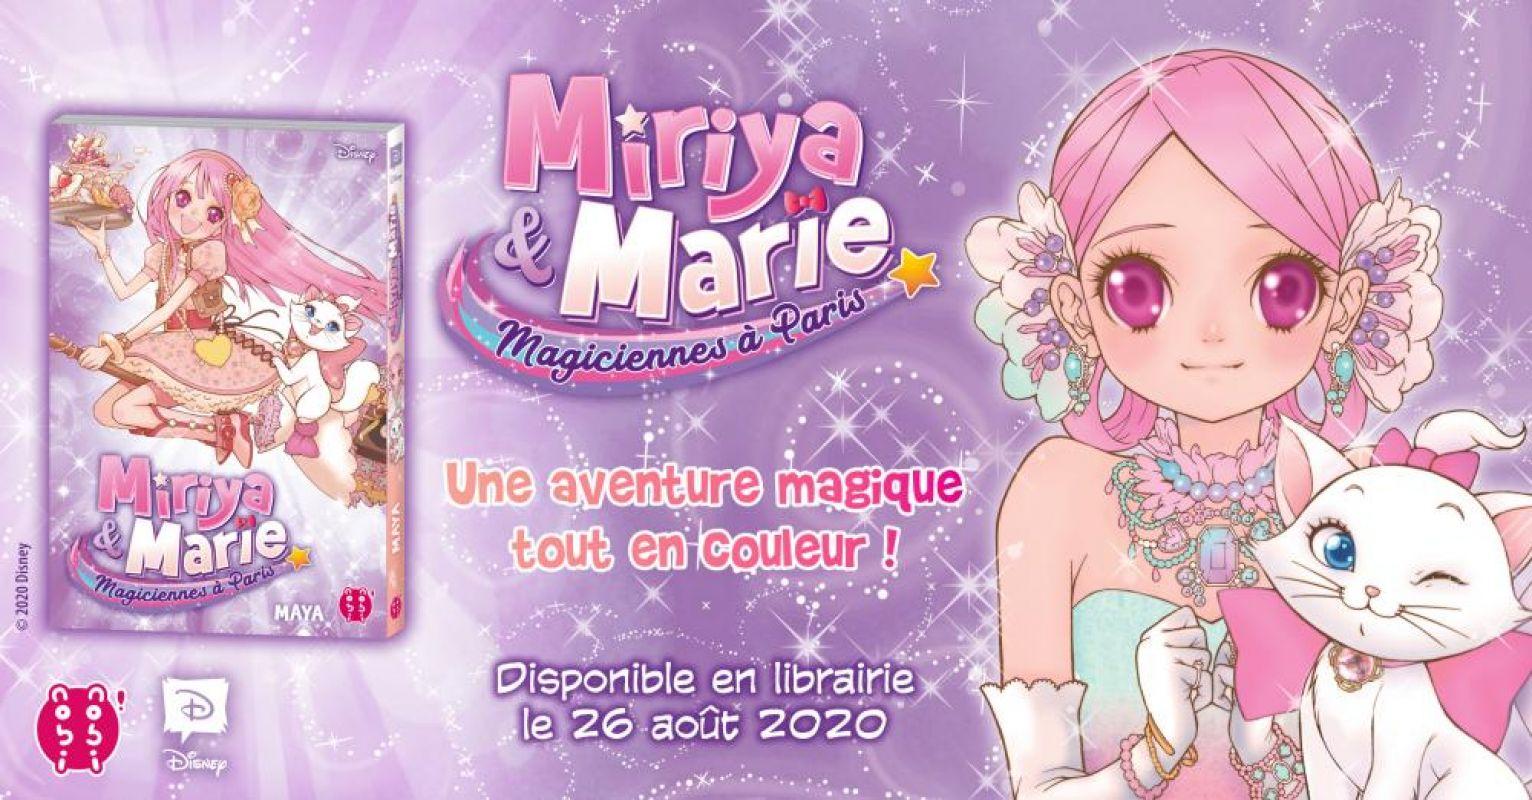 Miriya et Marie - Magiciennes à Paris chez nobi-nobi